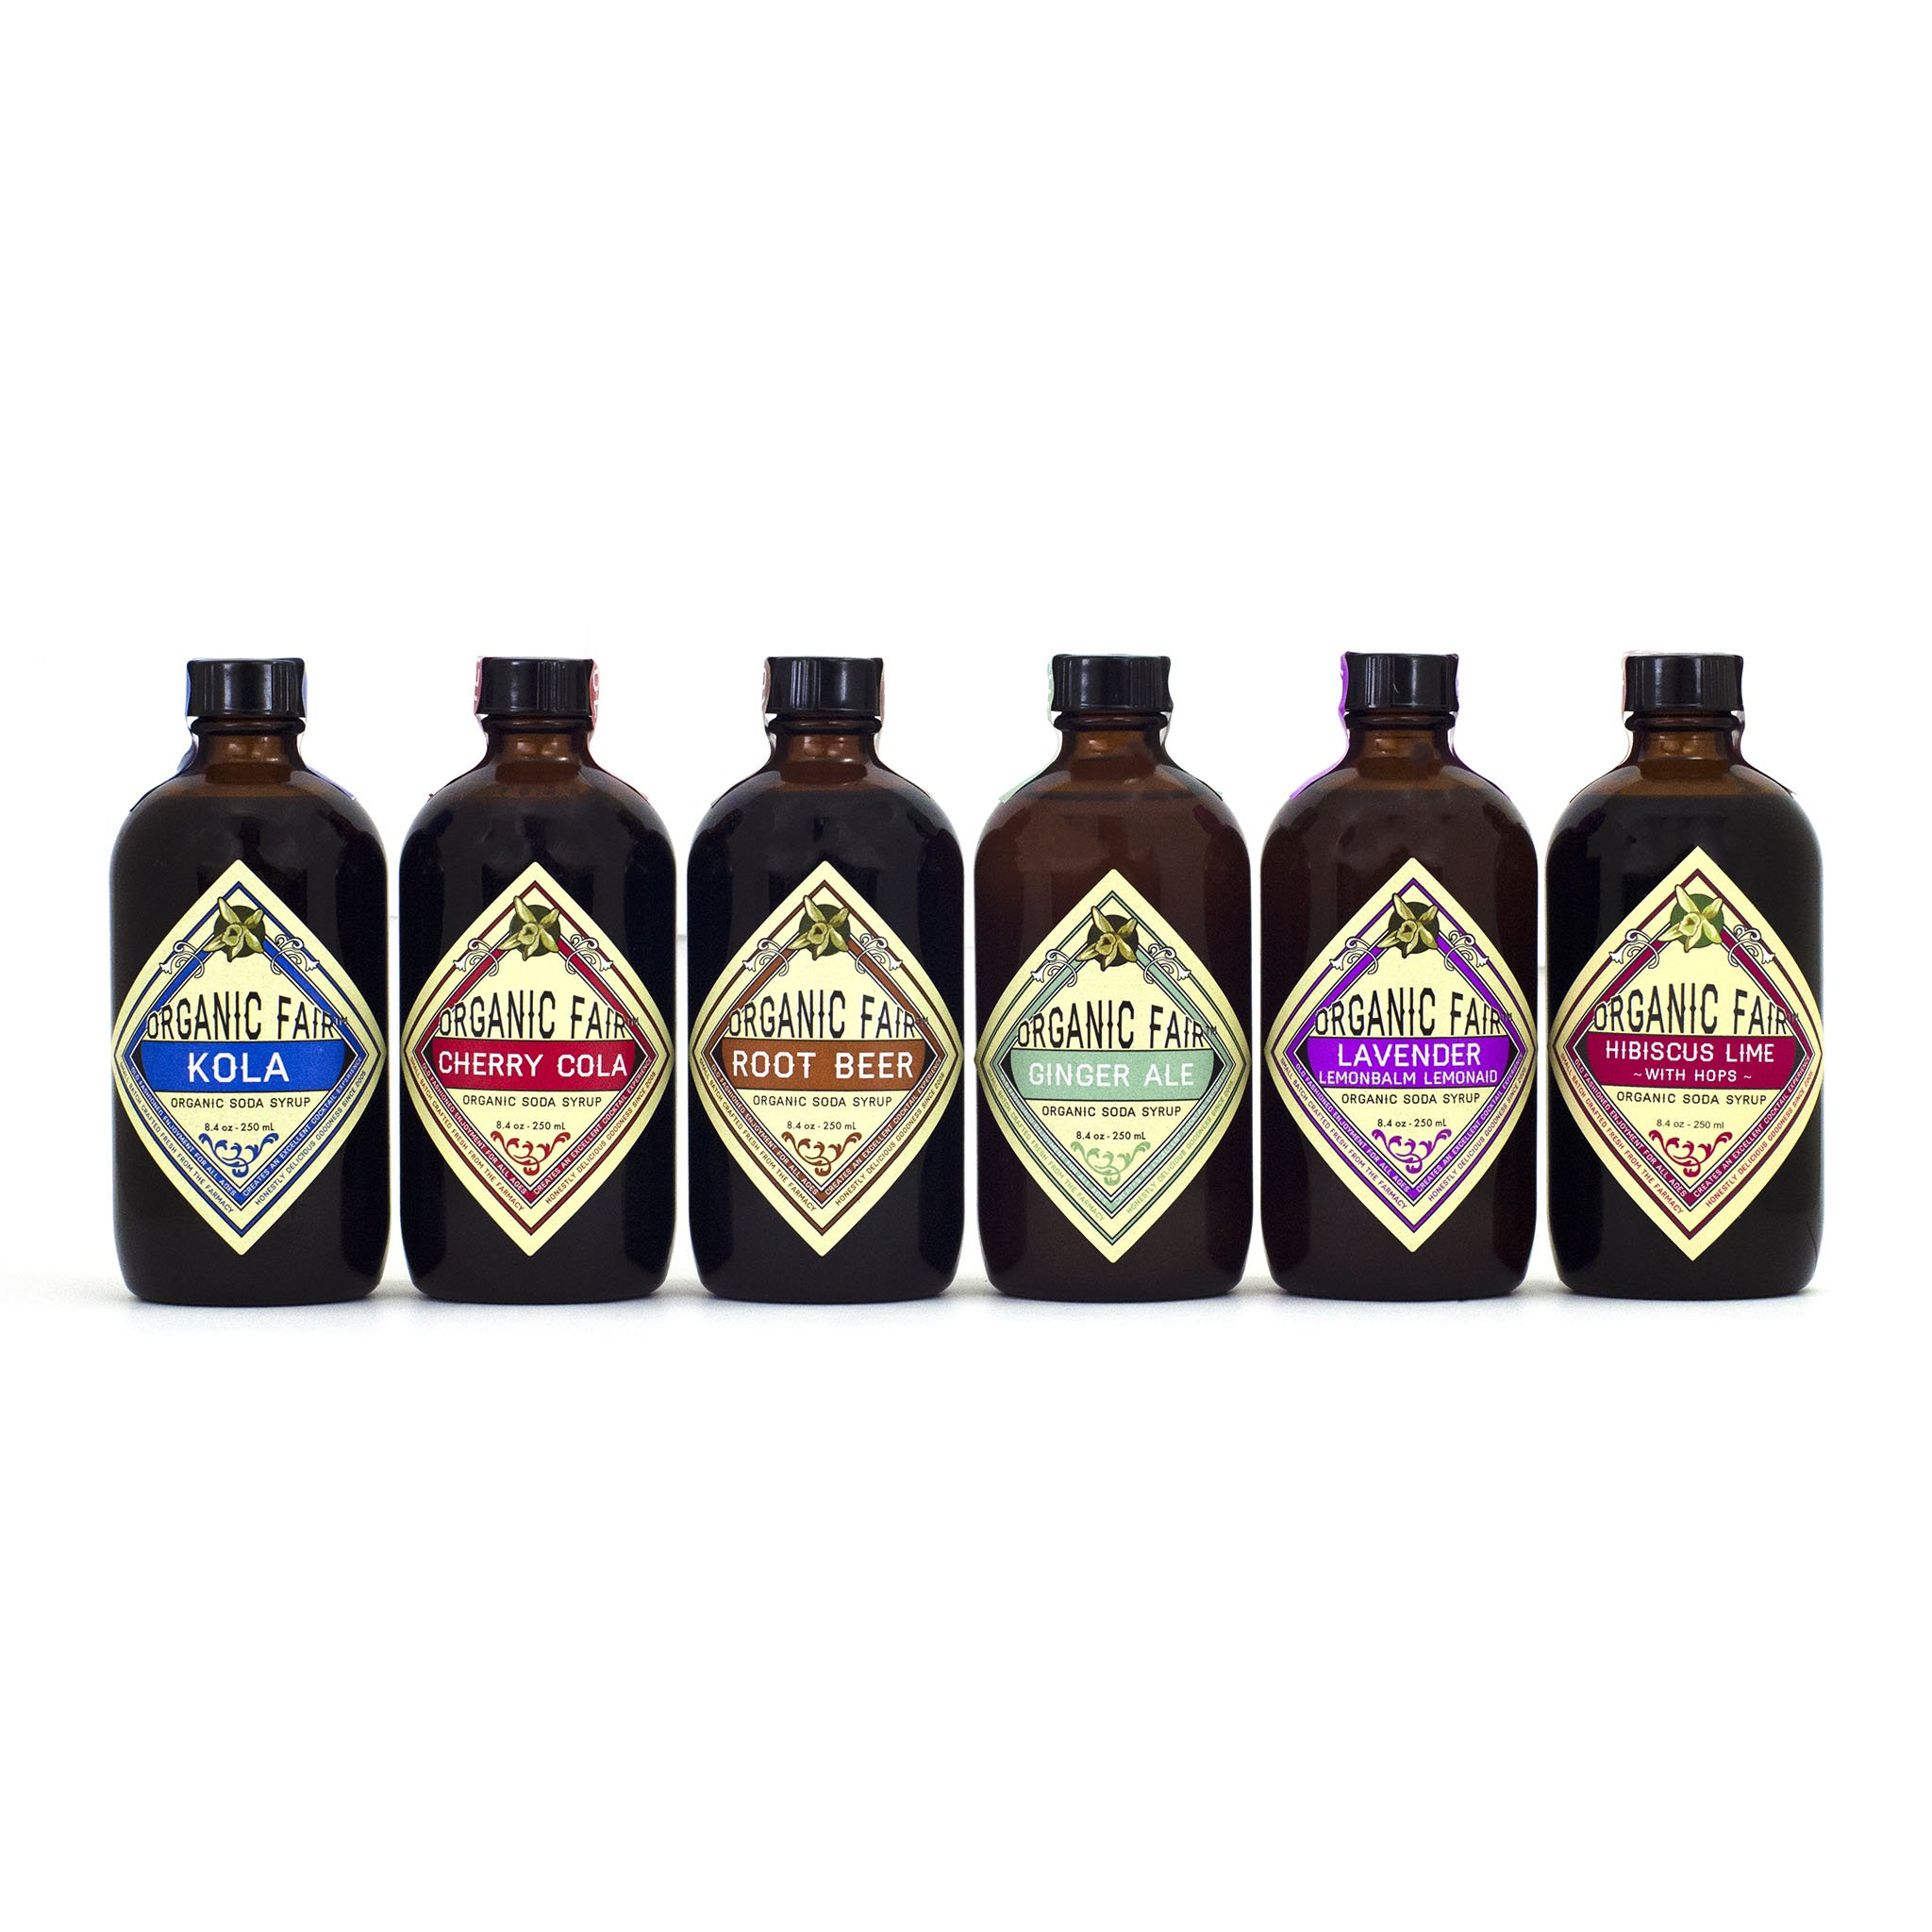 Organic Fair Soda Syrup Set by Organic Fair